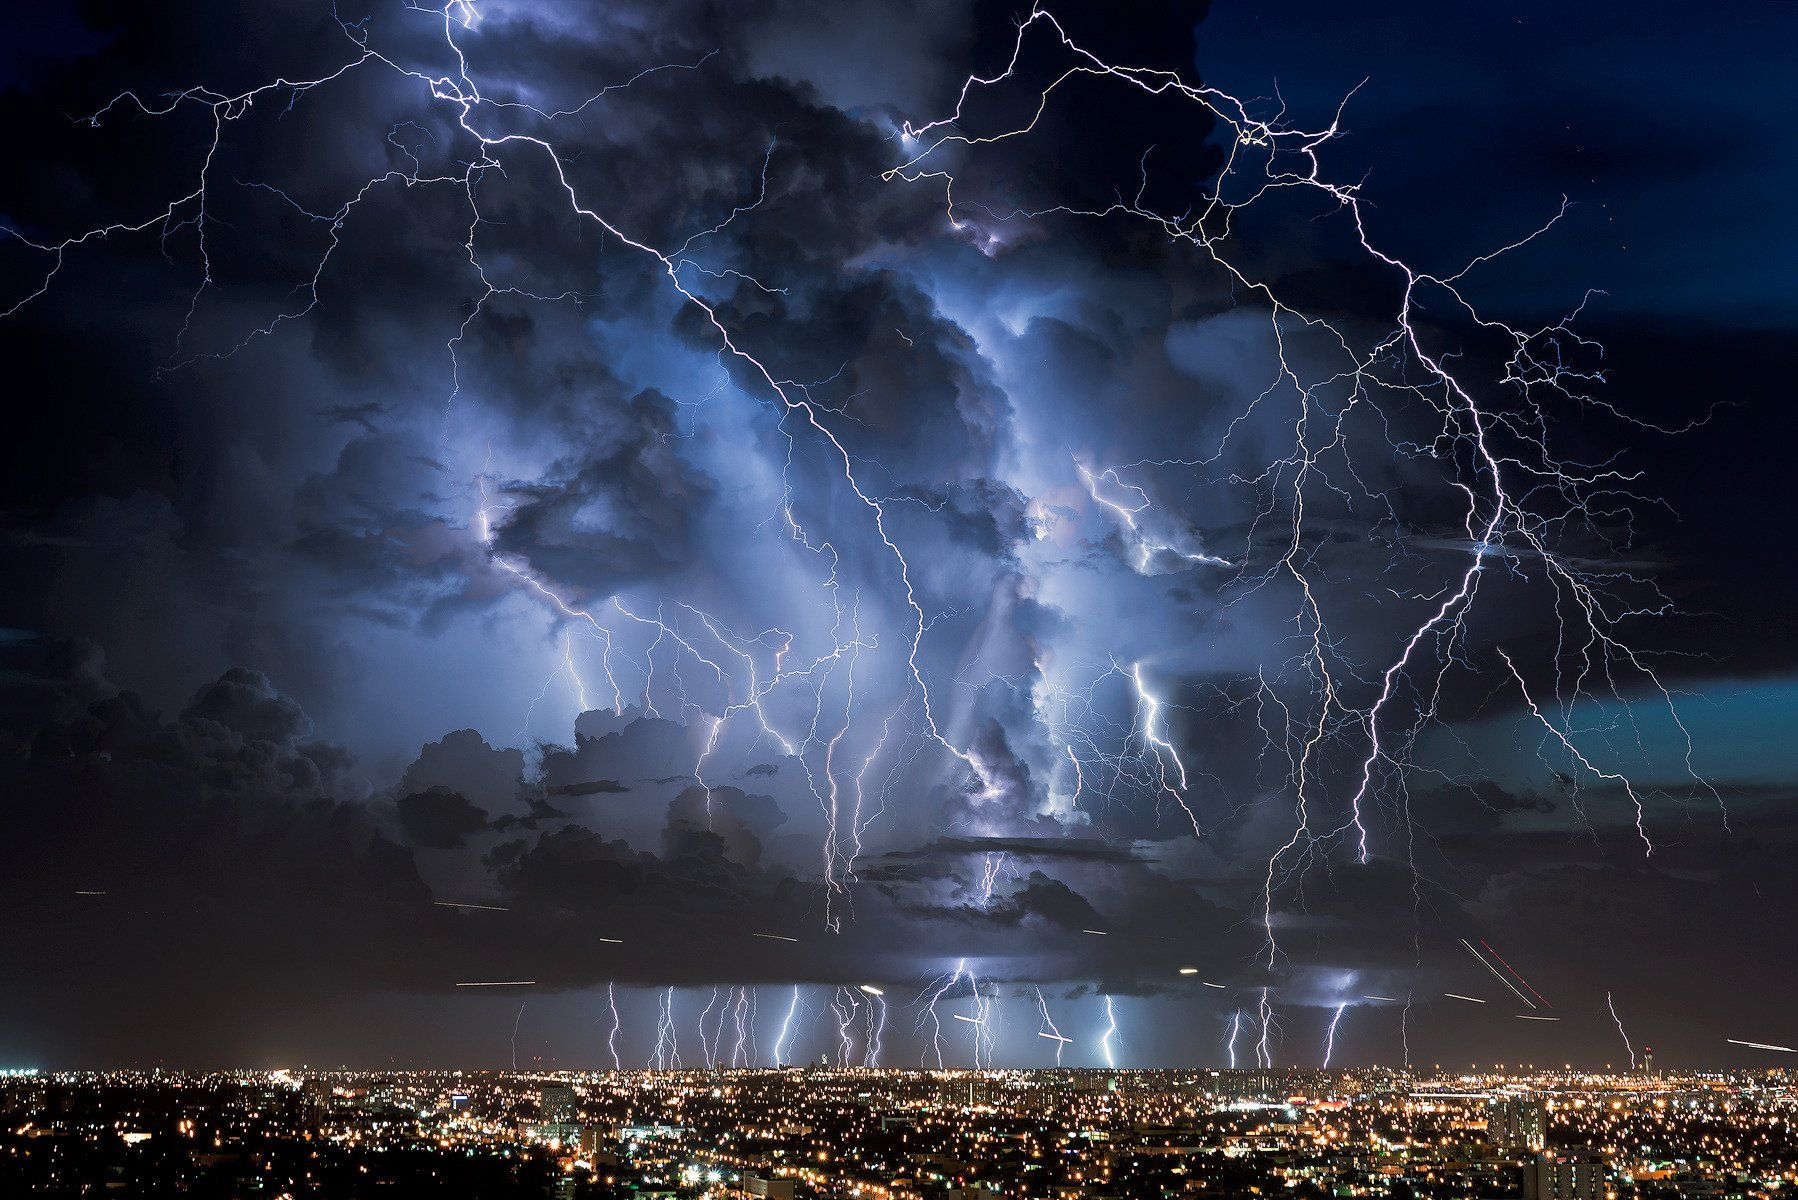 Wallpapers Hd Huracanes Tormentas Eléctricas Storm